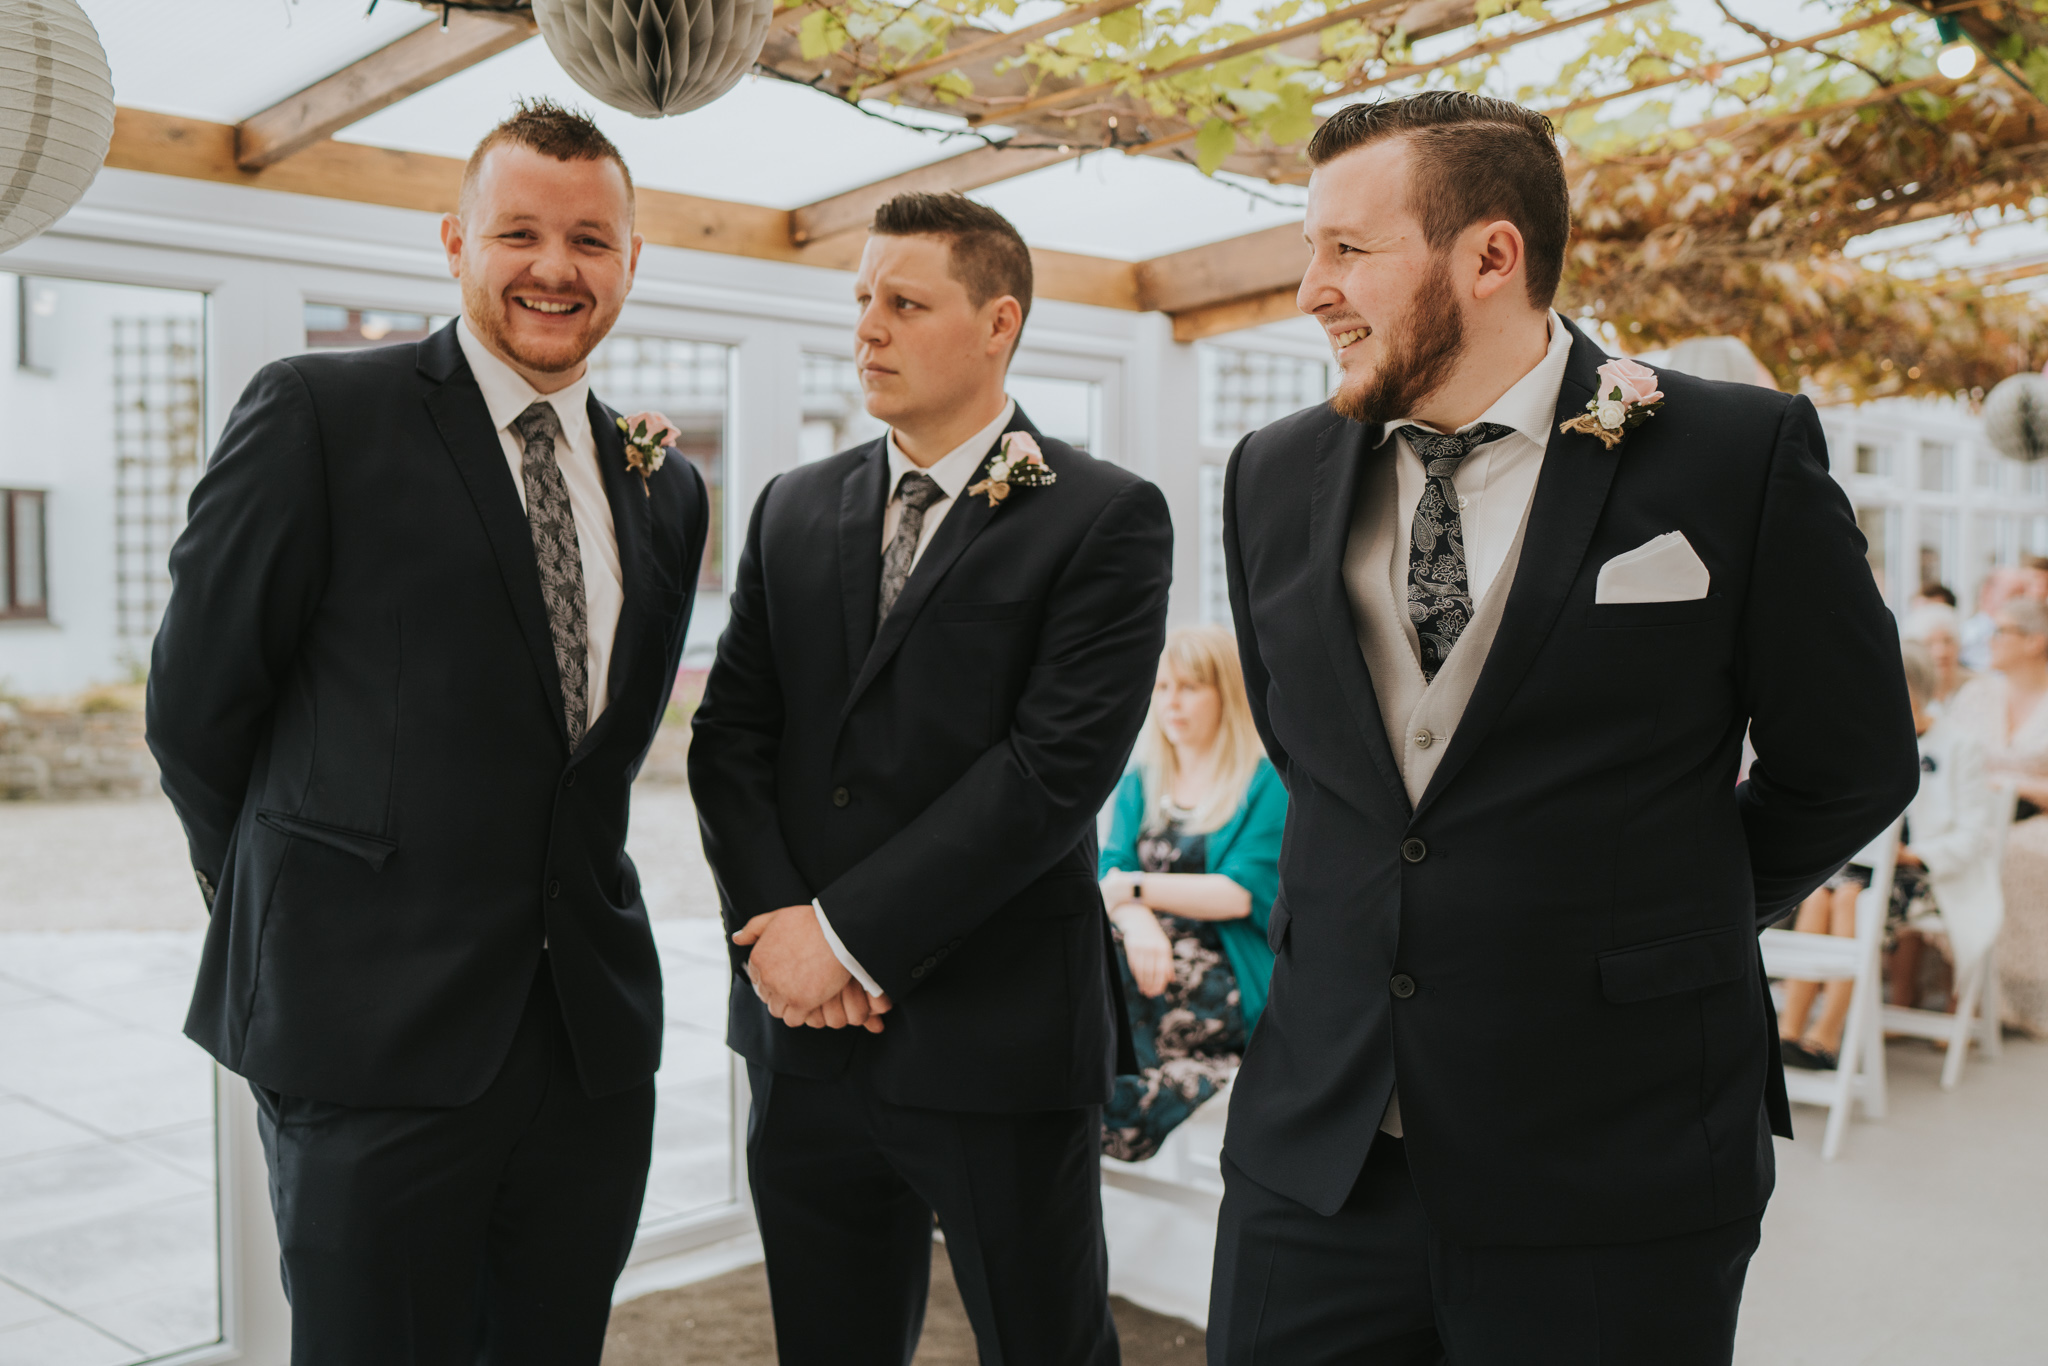 grace-sam-old-barn-clovelly-devon-wedding-photographer-grace-elizabeth-essex-suffolk-norfolk-wedding-photographer (36 of 132).jpg